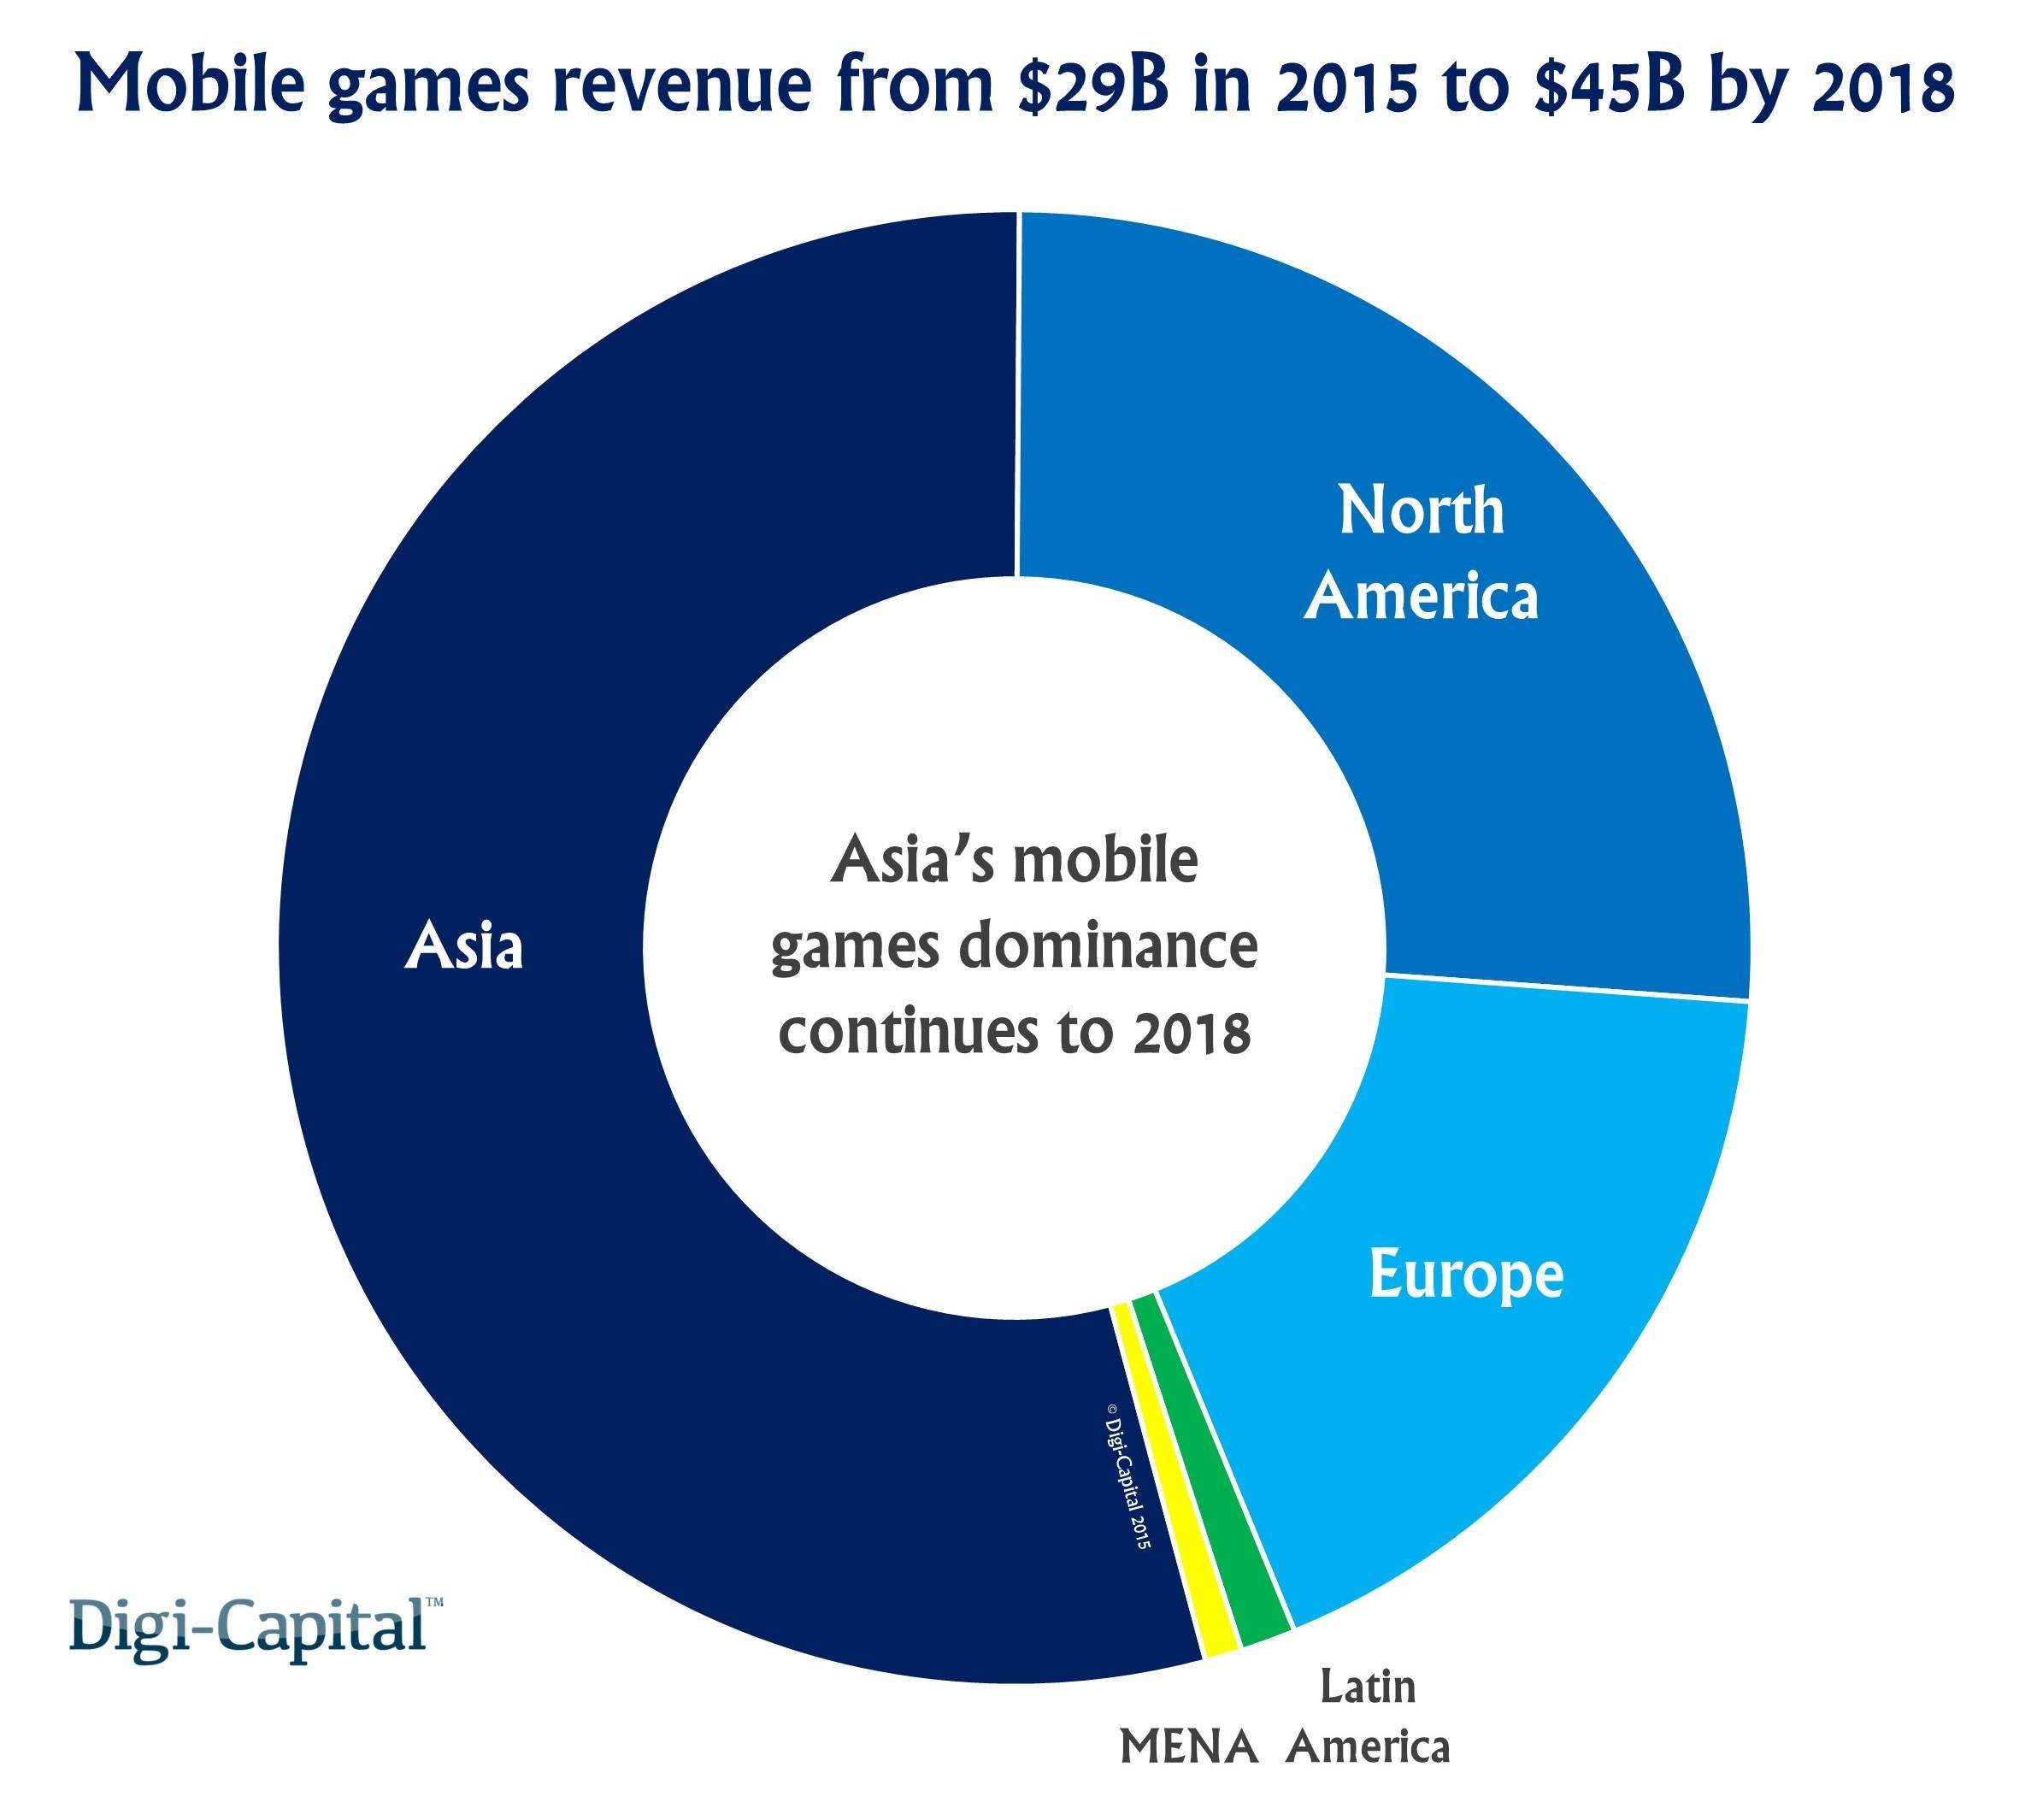 Mobile-games-region-revenue-forecast